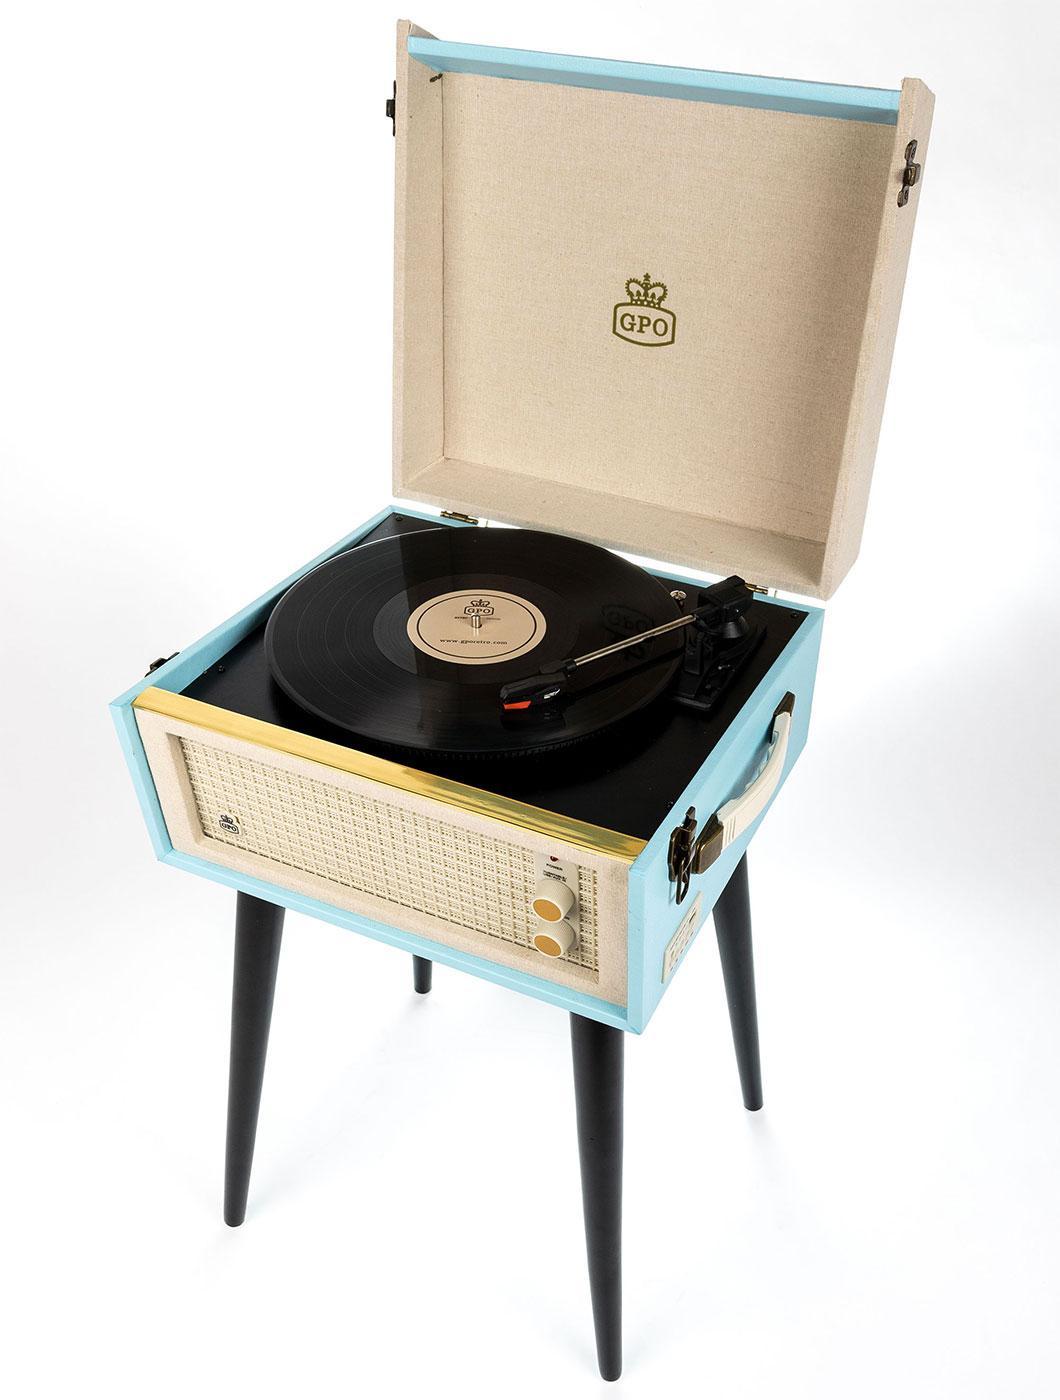 Bermuda GPO RETRO 1960s Mod Vintage Record Player